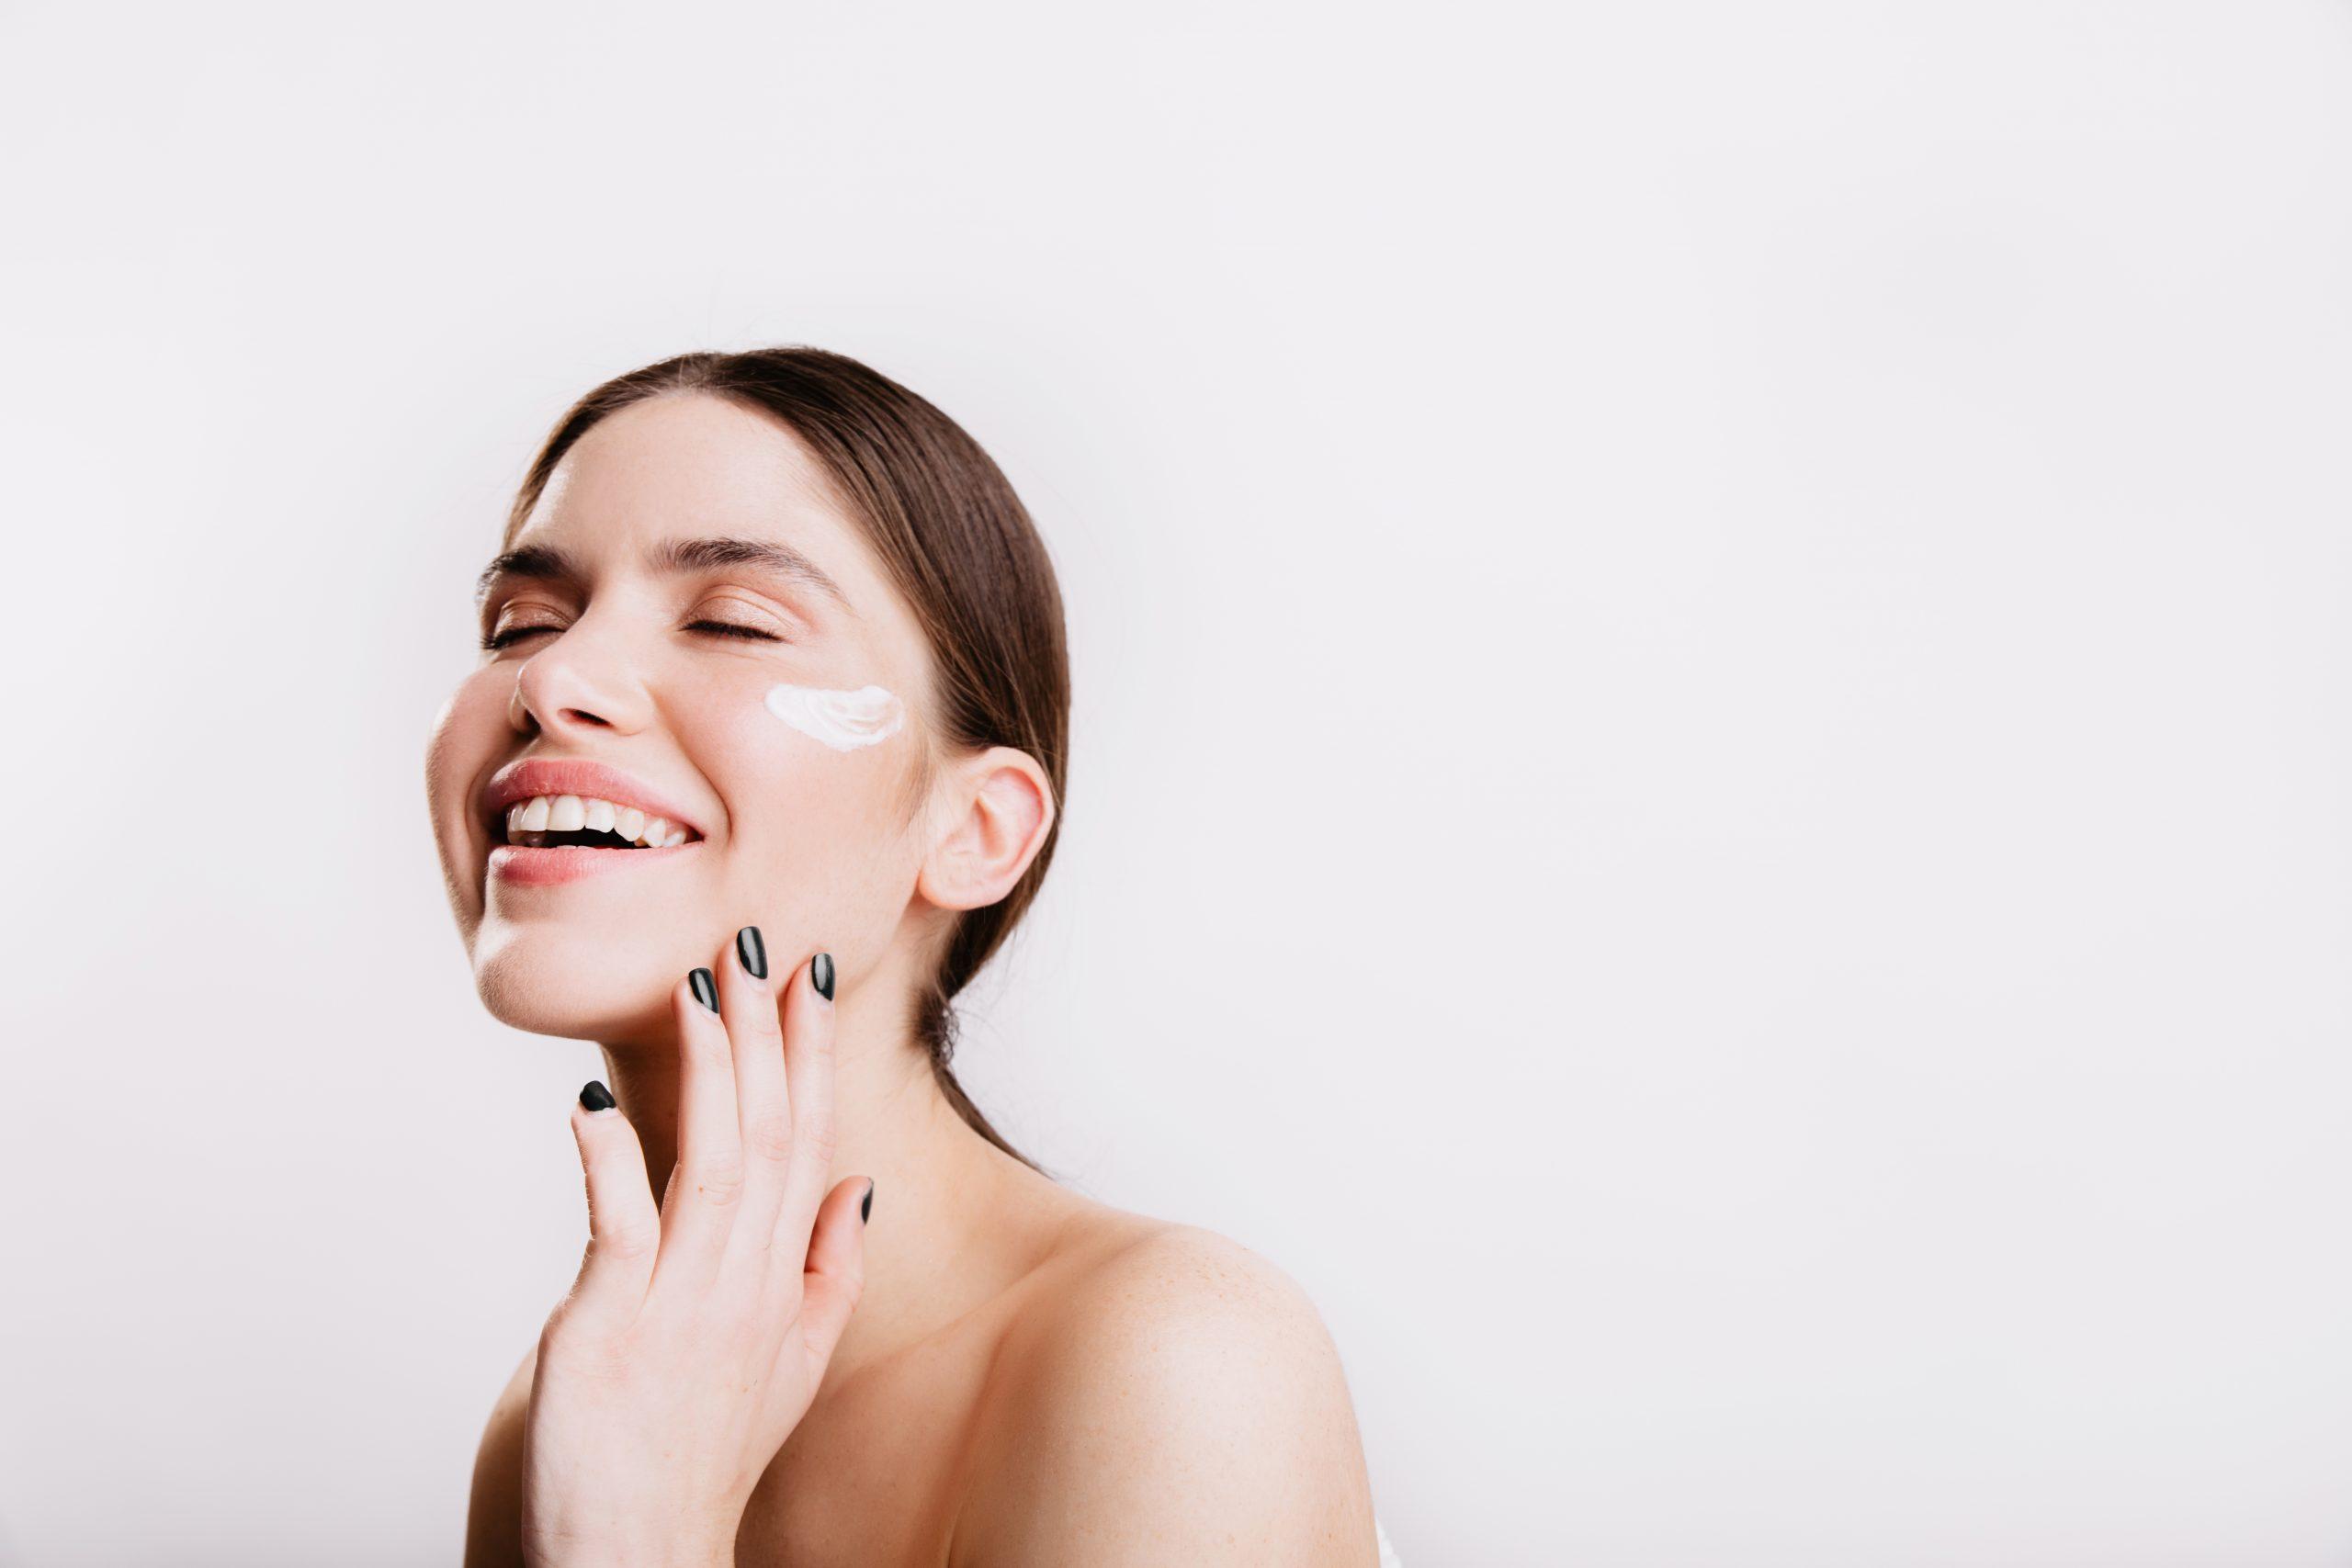 When does facial aging  begin?